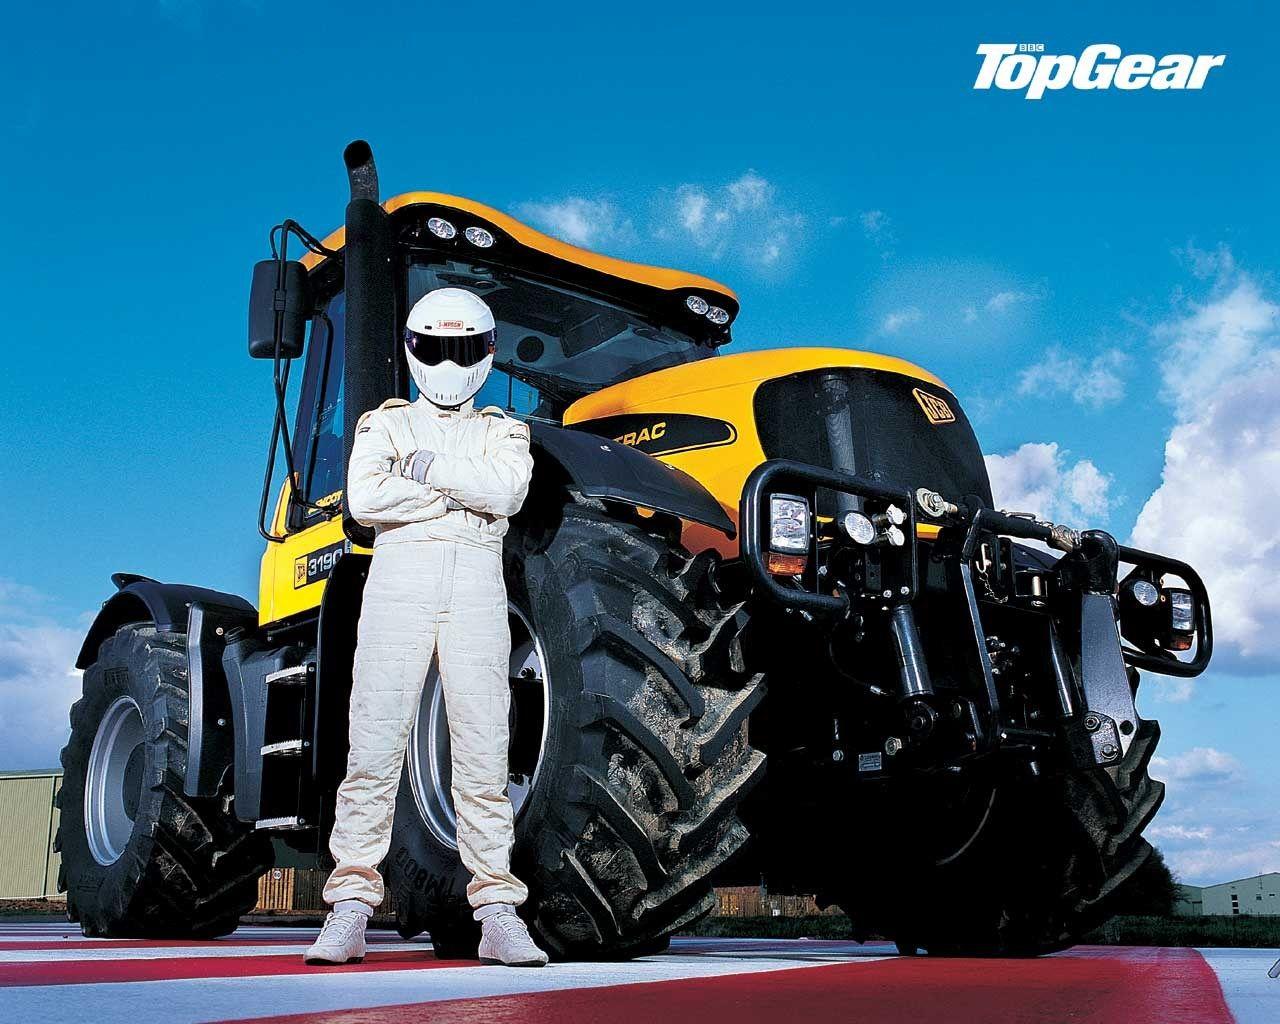 1280x1024 Hdq Images Top Gear Top Gear Top Gear Wallpaper Tractor Wallpaper